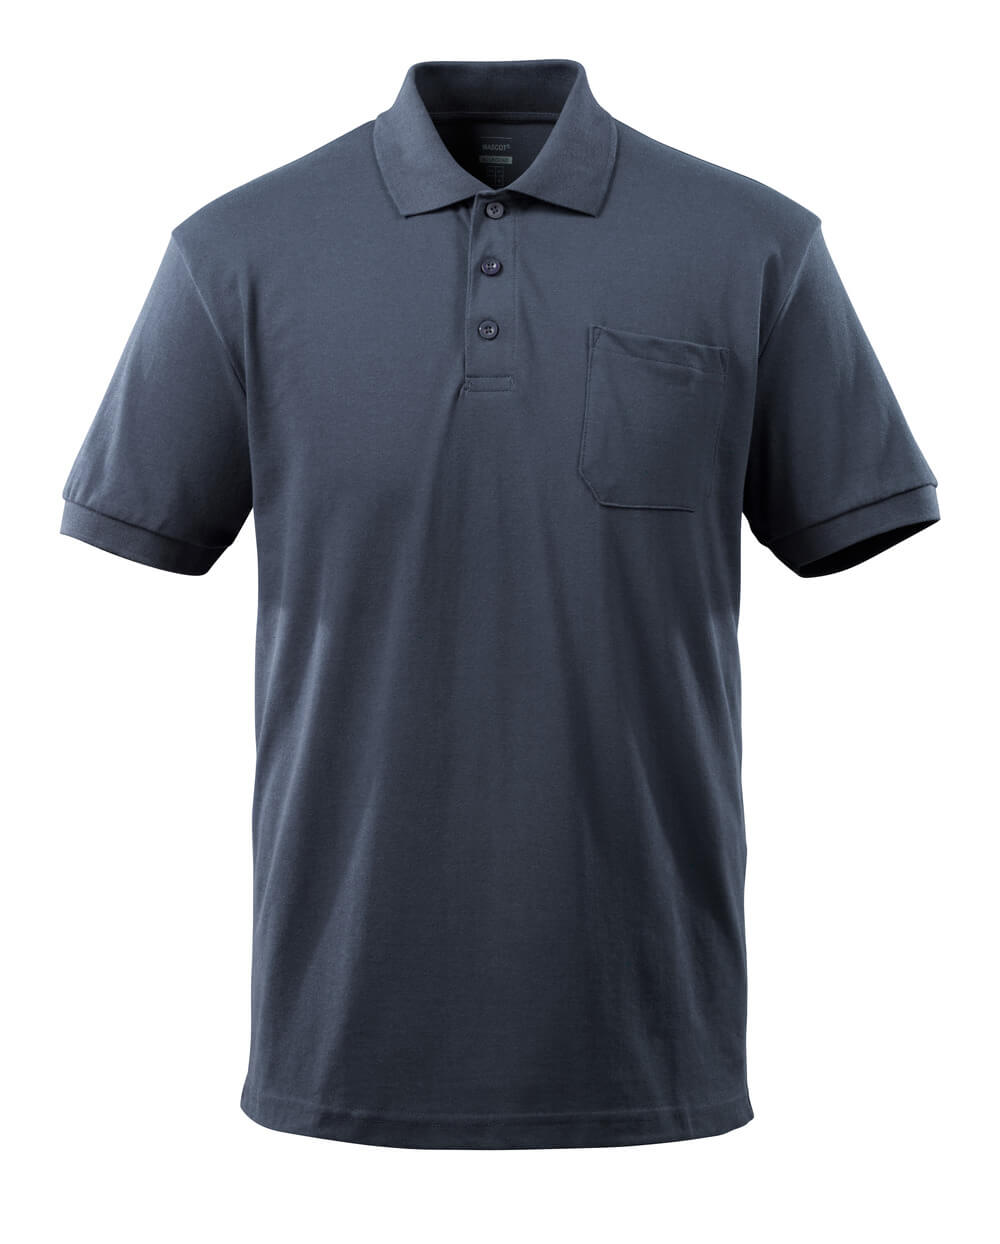 51586-968-010 Polo Shirt with chest pocket - dark navy